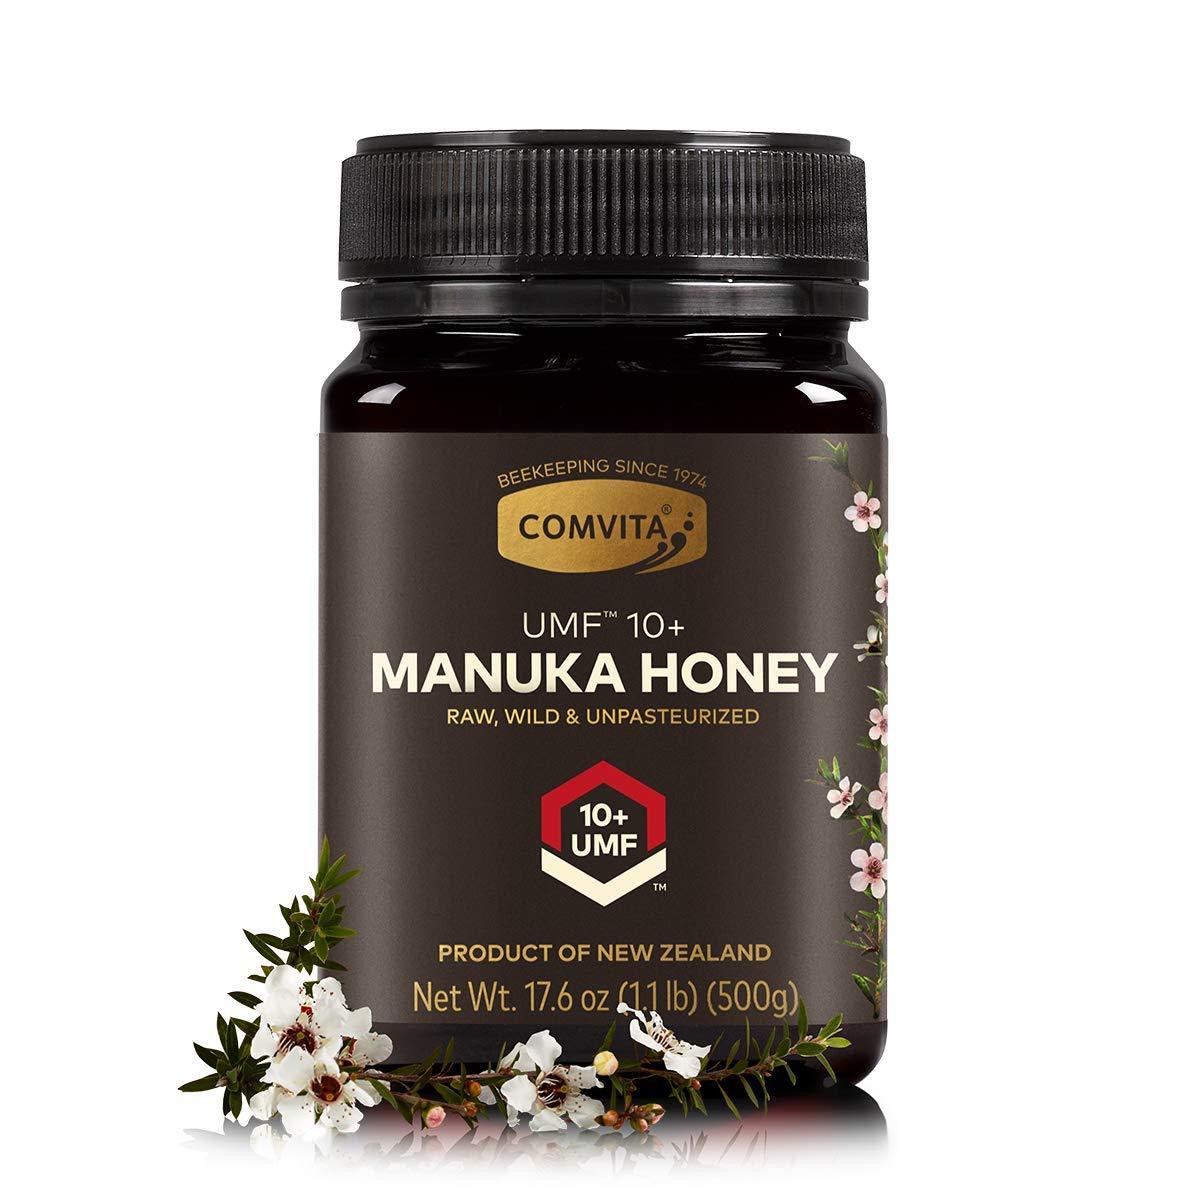 Comvita Certified UMF 10+ (MGO 263+) Manuka Honey | New Zealand's #1 Manuka Brand | Raw, Non-GMO, Halal, and Kosher | Premium Grade (17.6 oz)